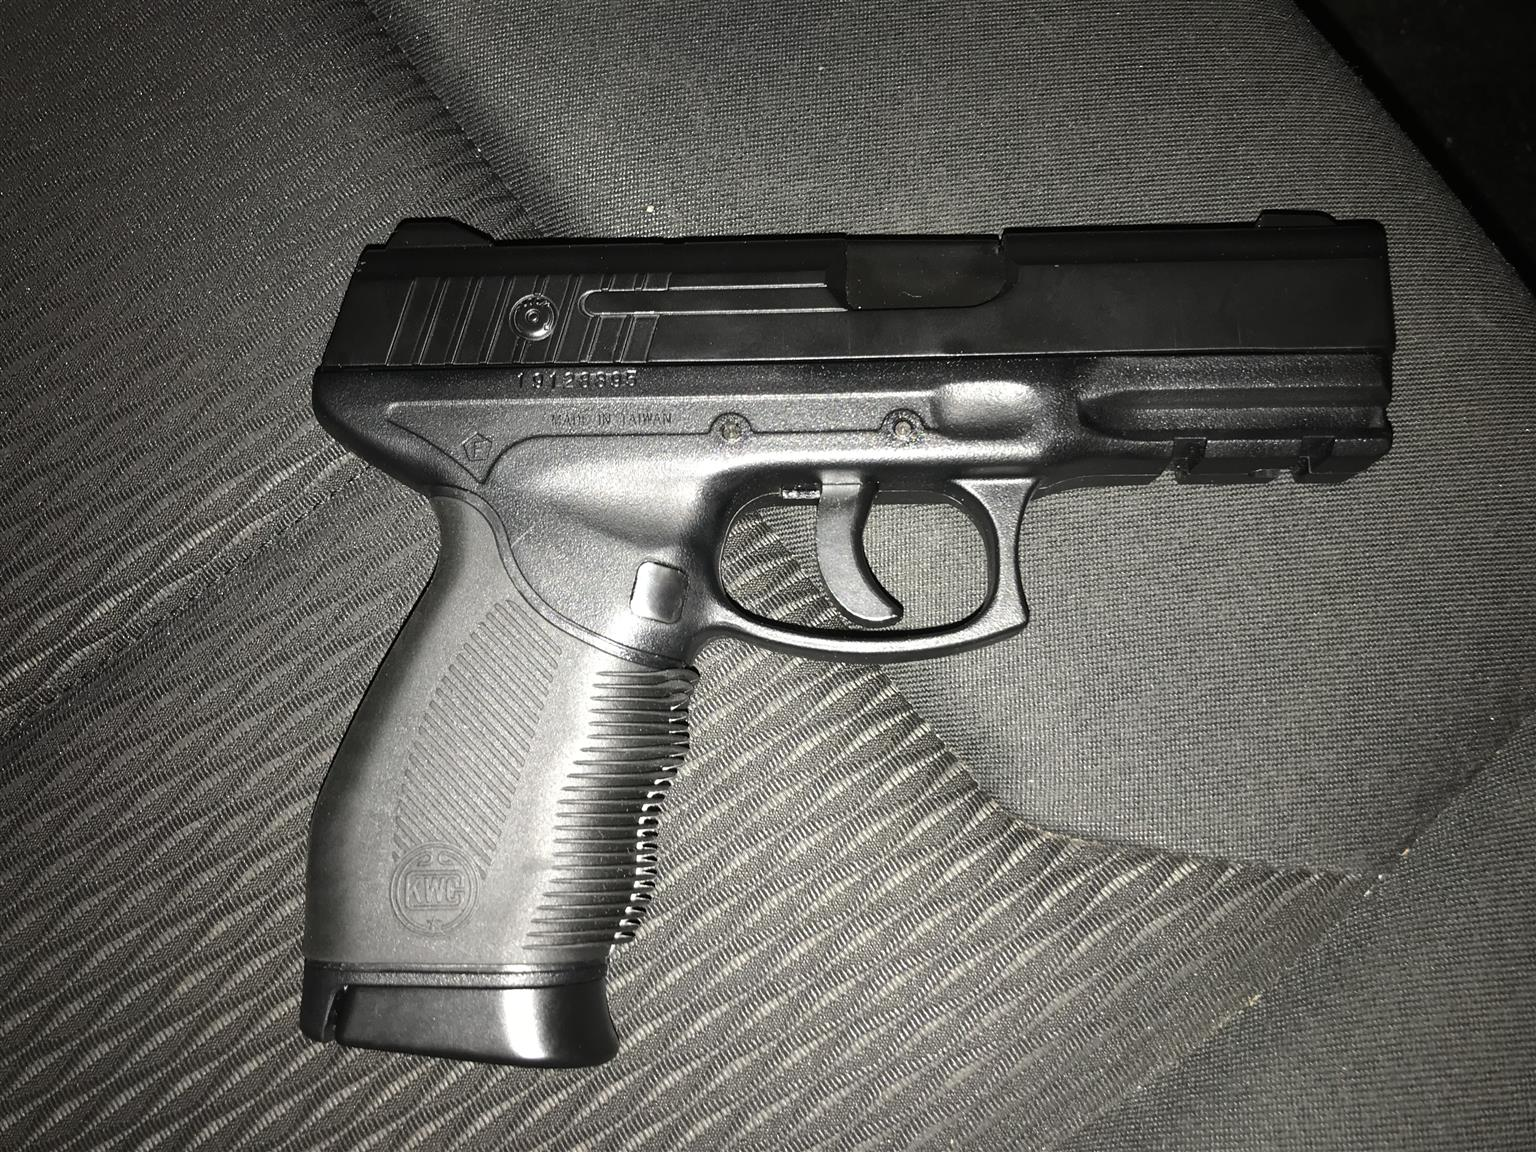 KWC gas pistol.